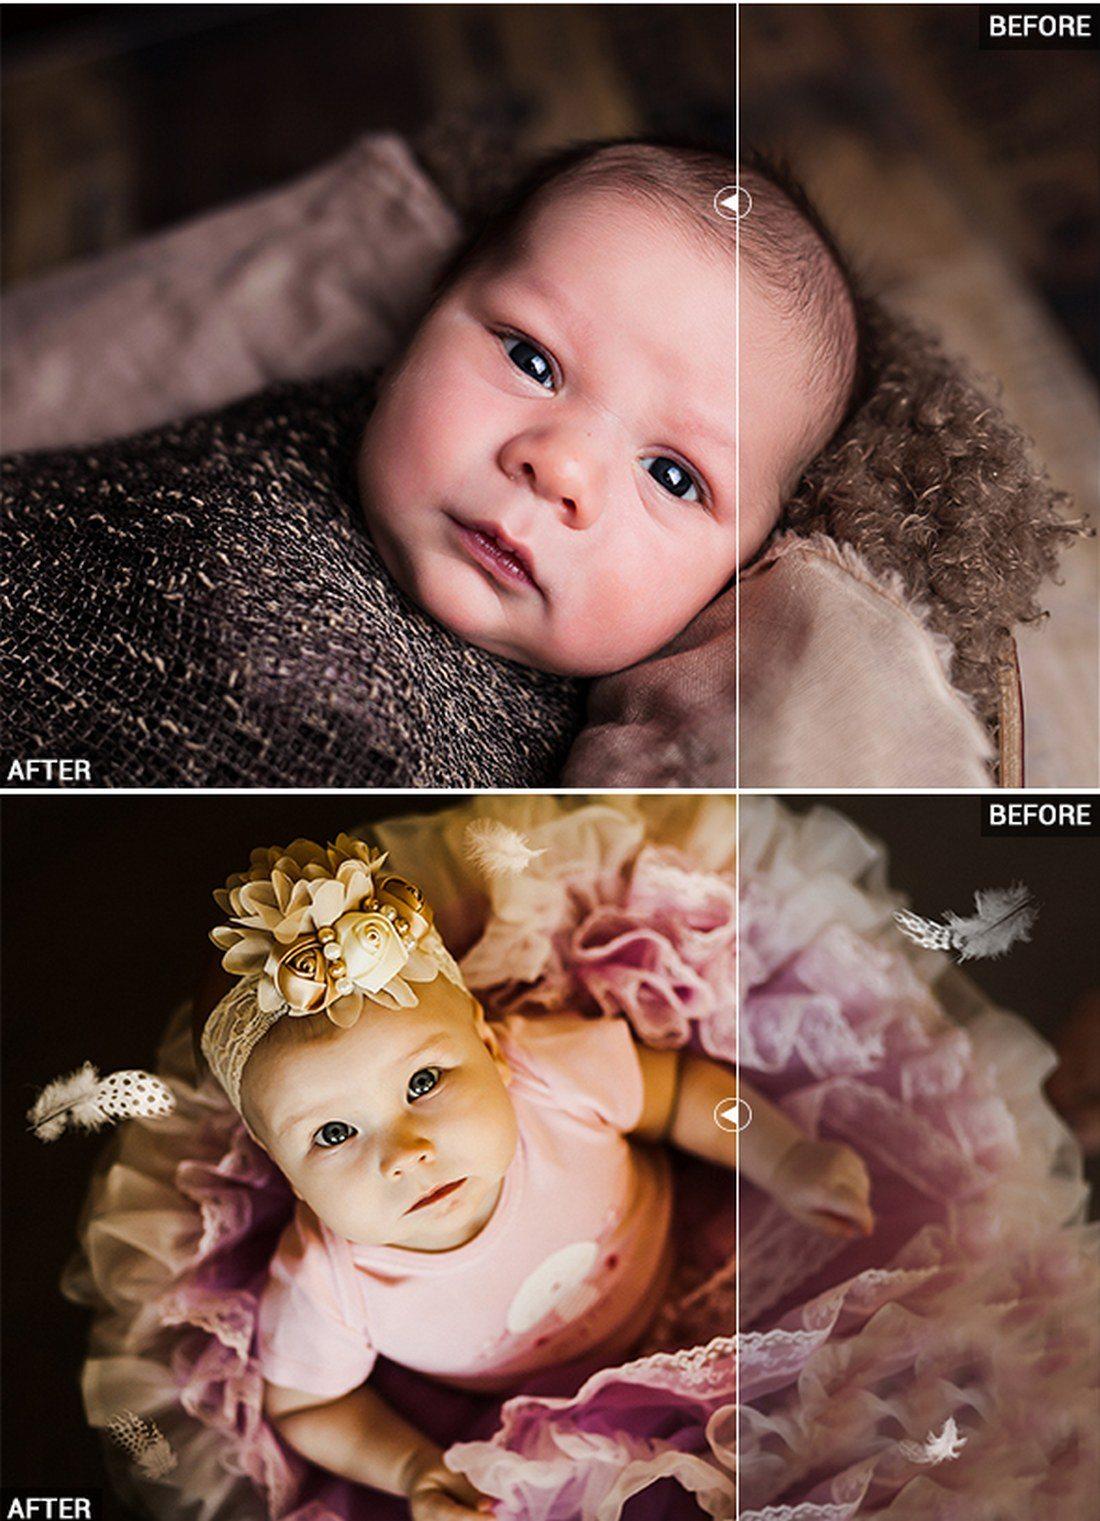 30-Babies-Day-Lightroom-Presets 20 Best Newborn Lightroom Presets for Baby Photography design tips